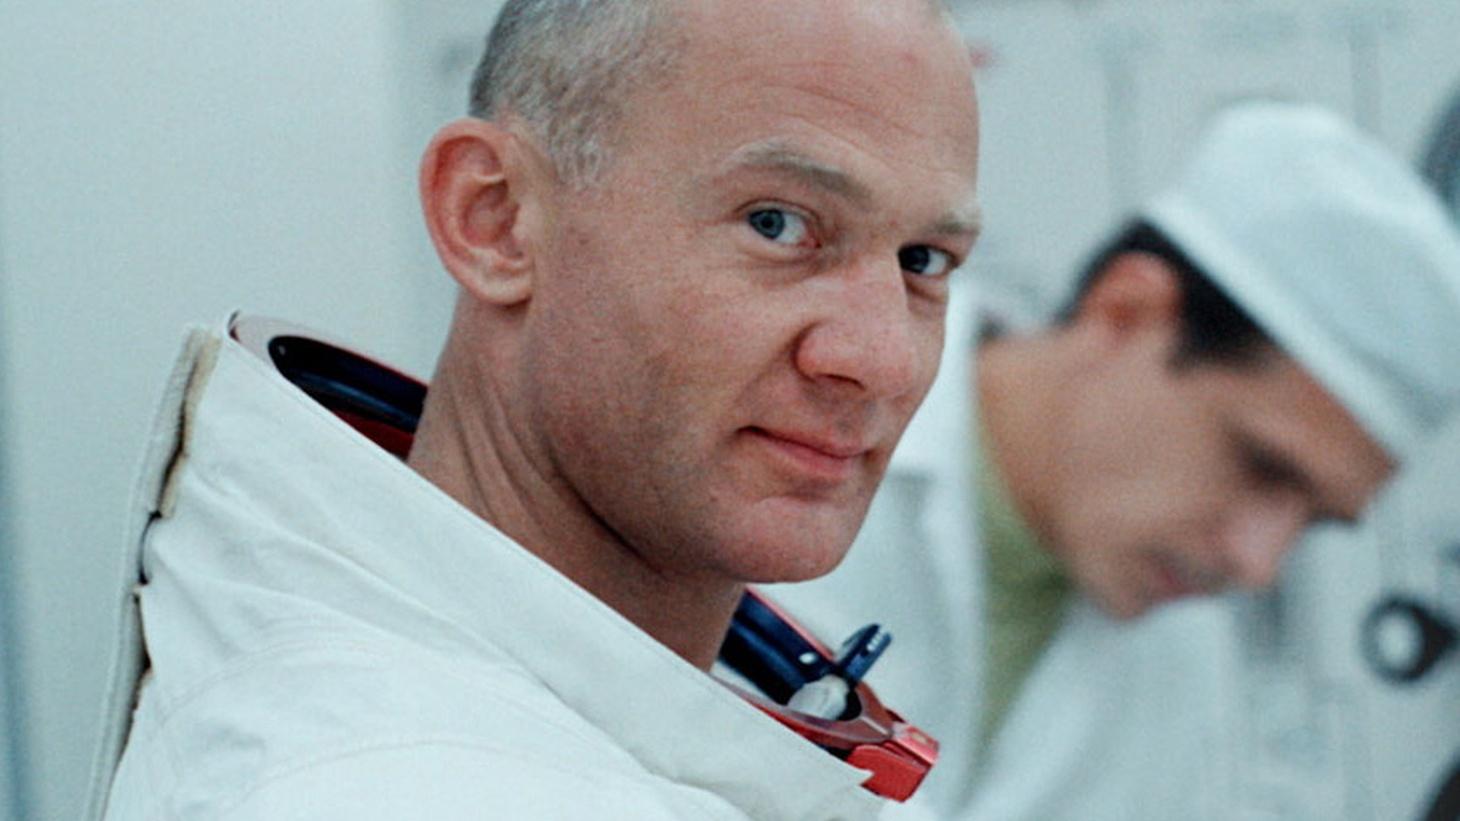 Astronaut Buzz Aldrin in 'Apollo 11'